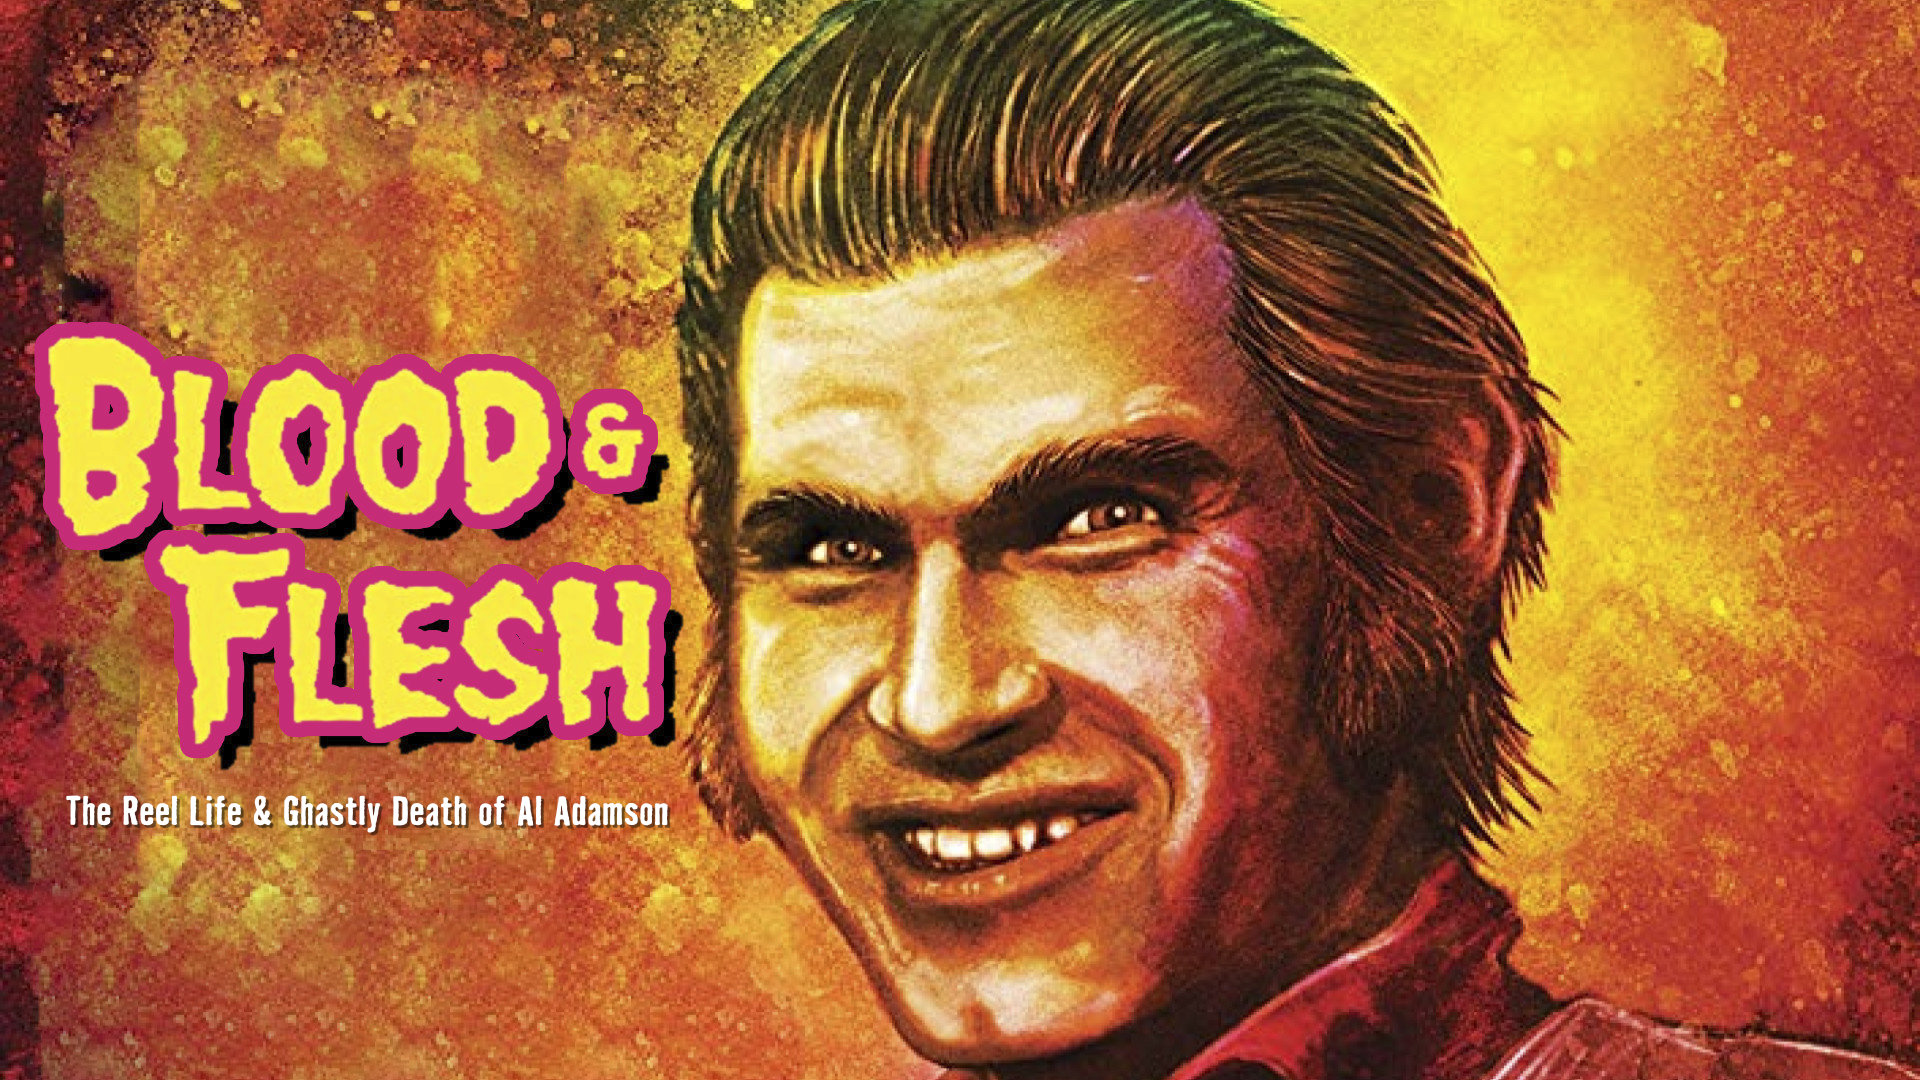 Blood & Flesh - The Reel Life & Ghastly Death of Al Adamson